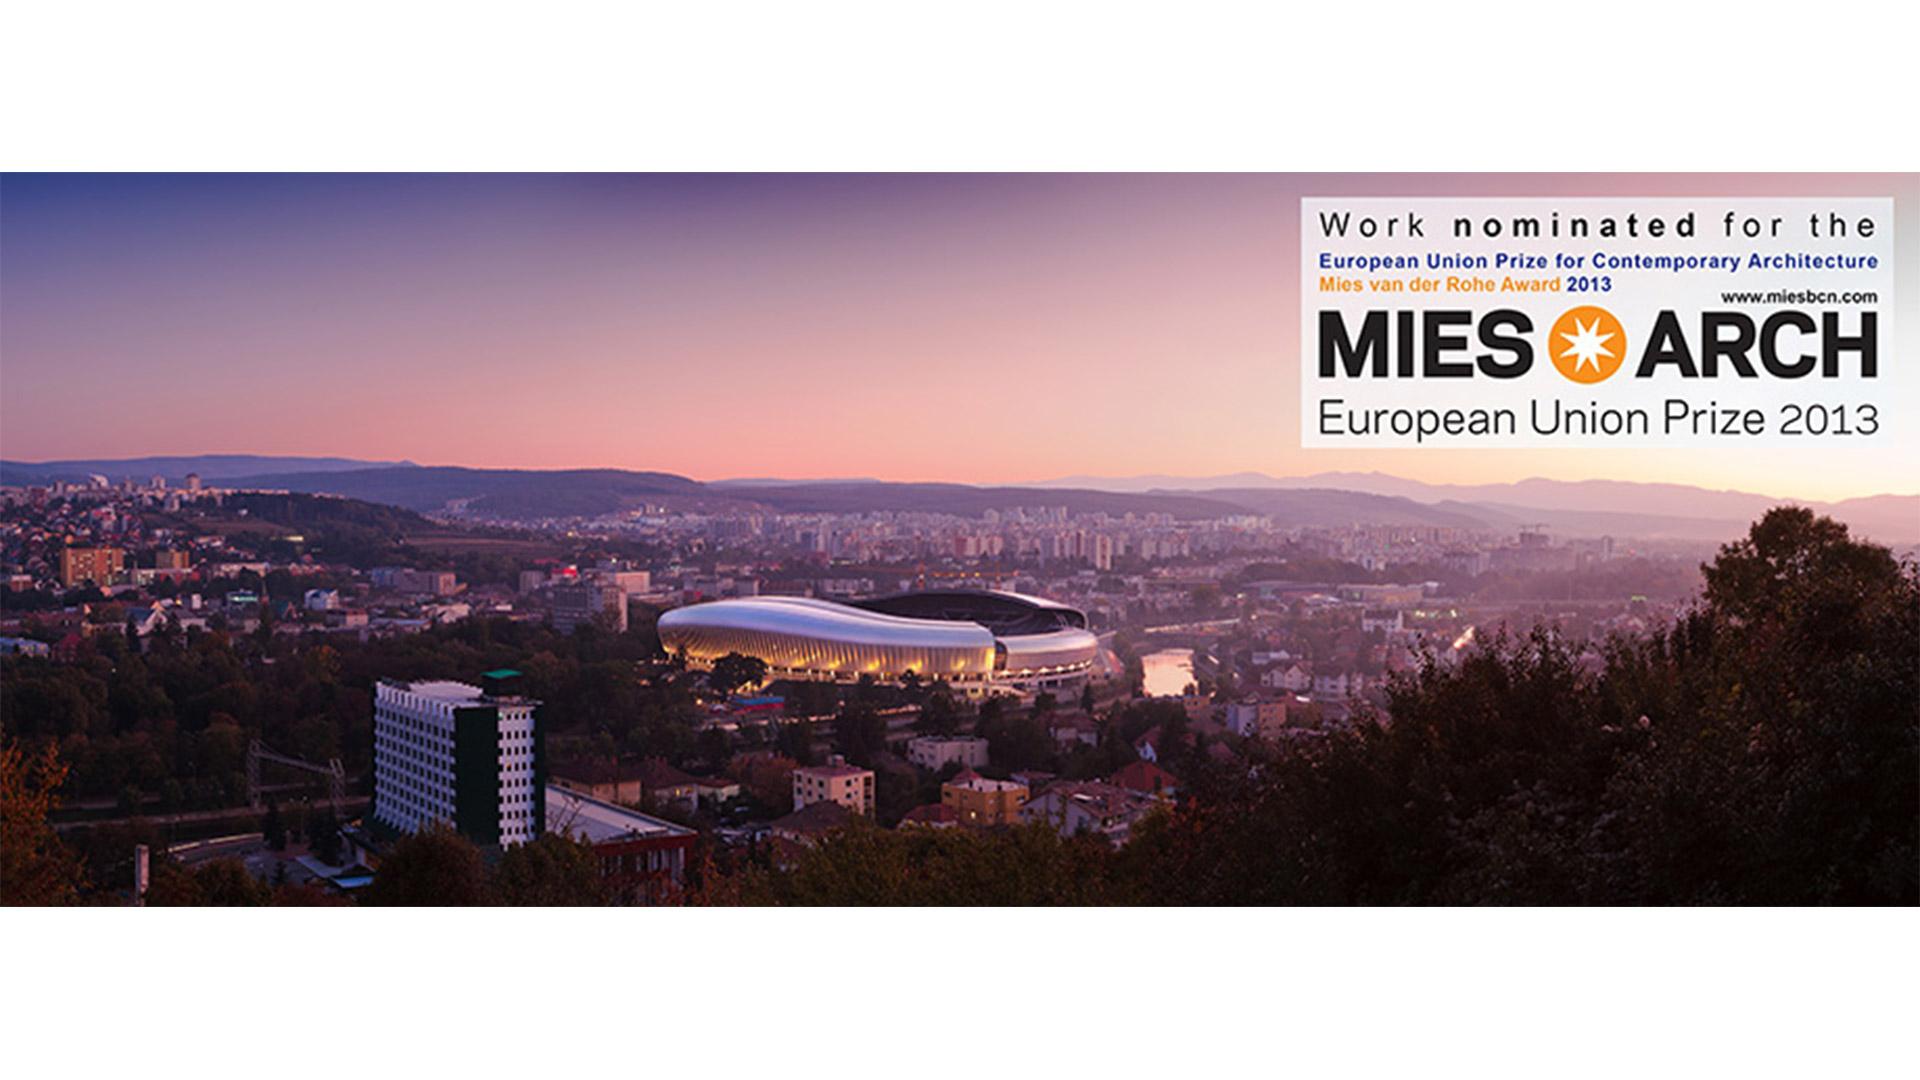 Nominalizare la Premiul Uniunii Europene pentru Arhitectura Contemporana Mies van der Rohe, Barcelona, 2013